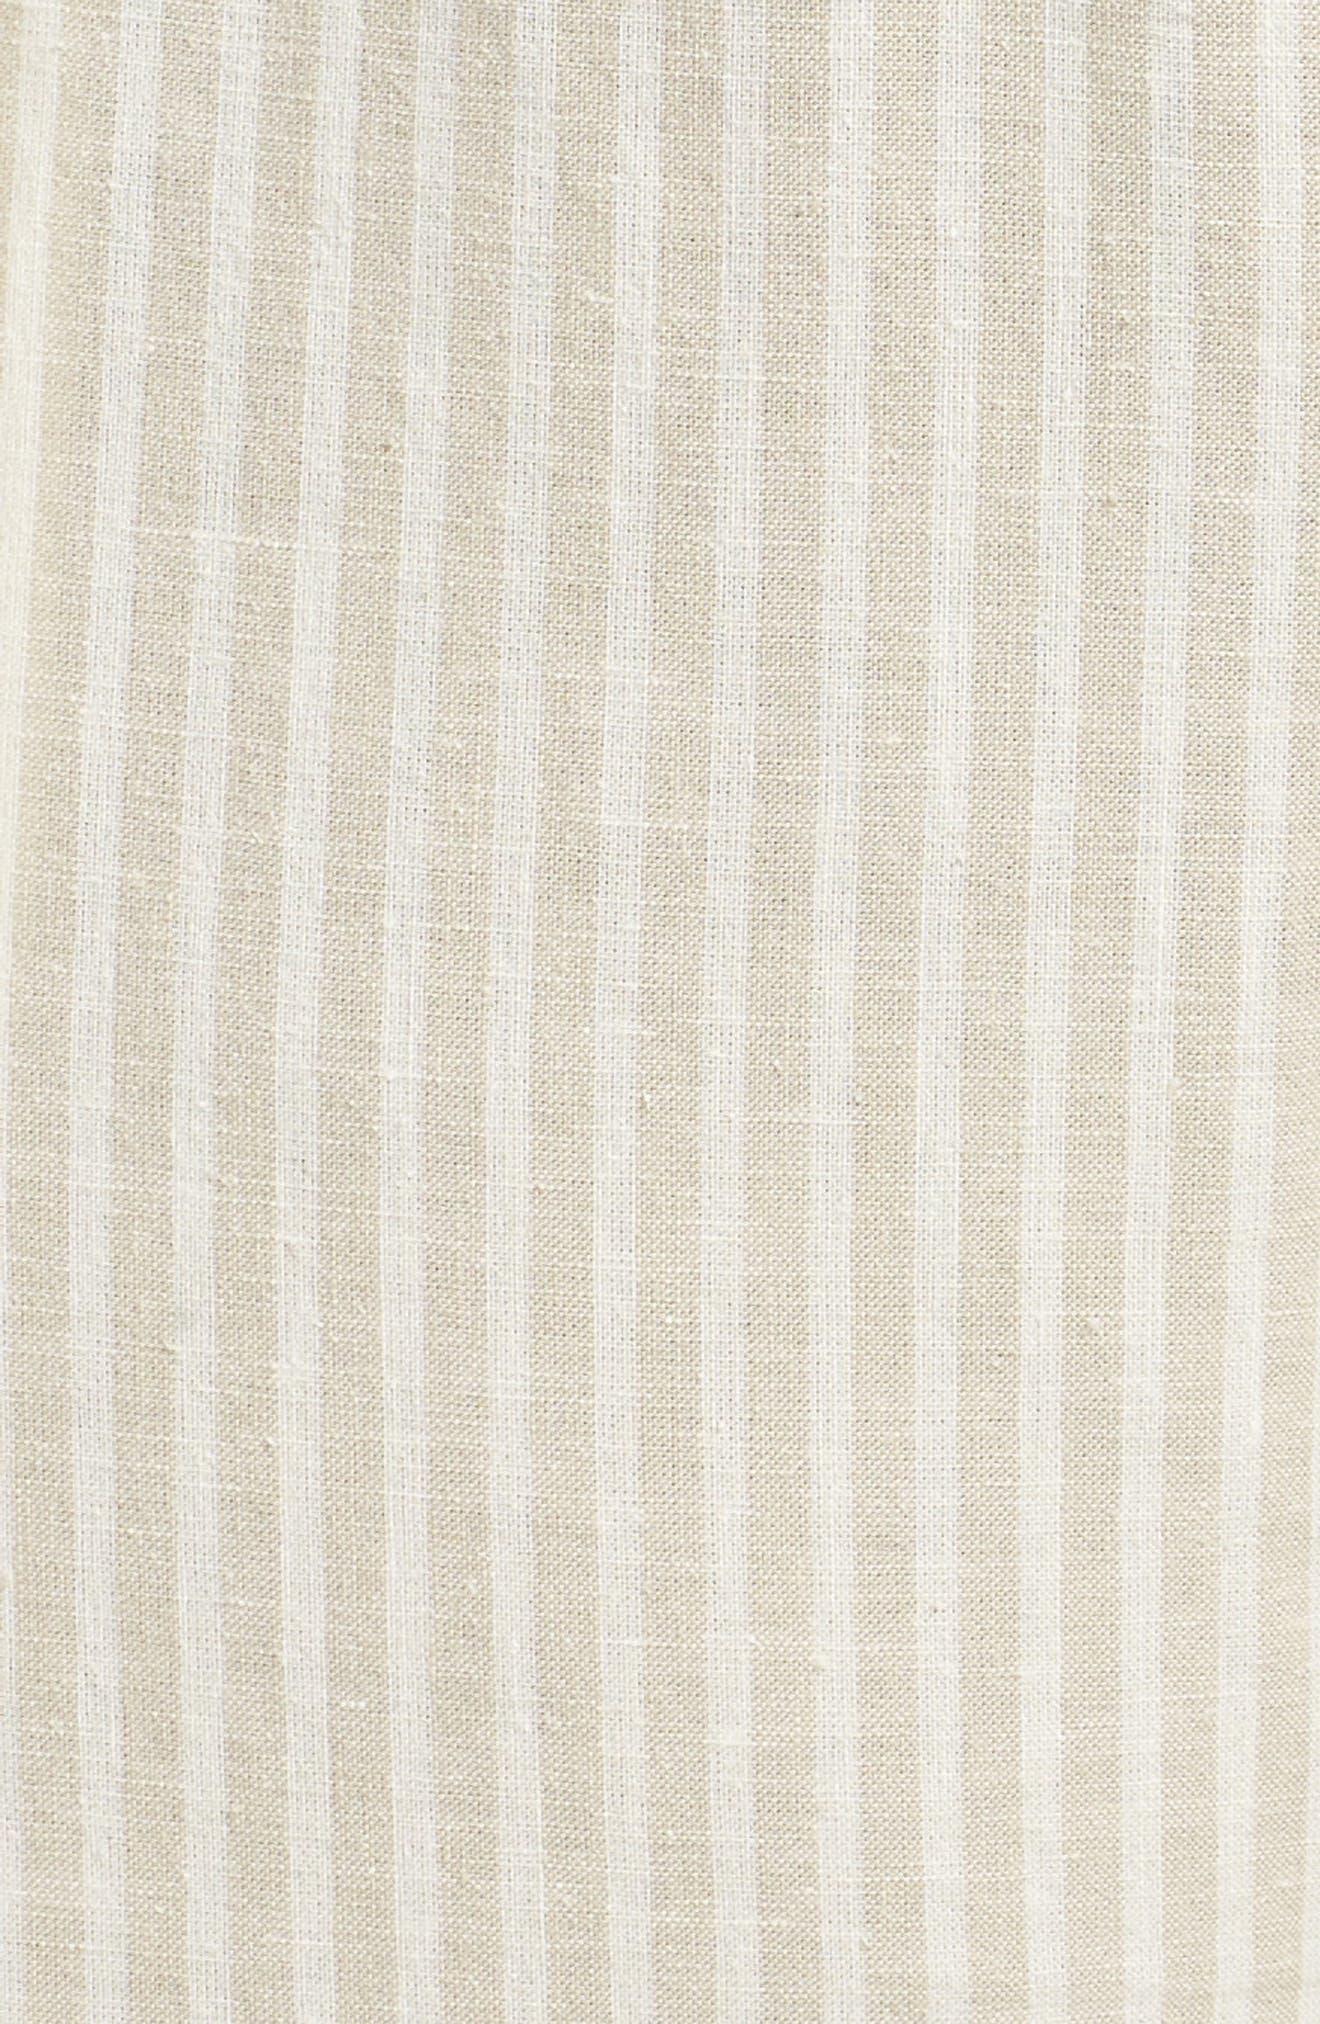 Stripe Ankle Hemp & Cotton Pants,                             Alternate thumbnail 6, color,                             Natural